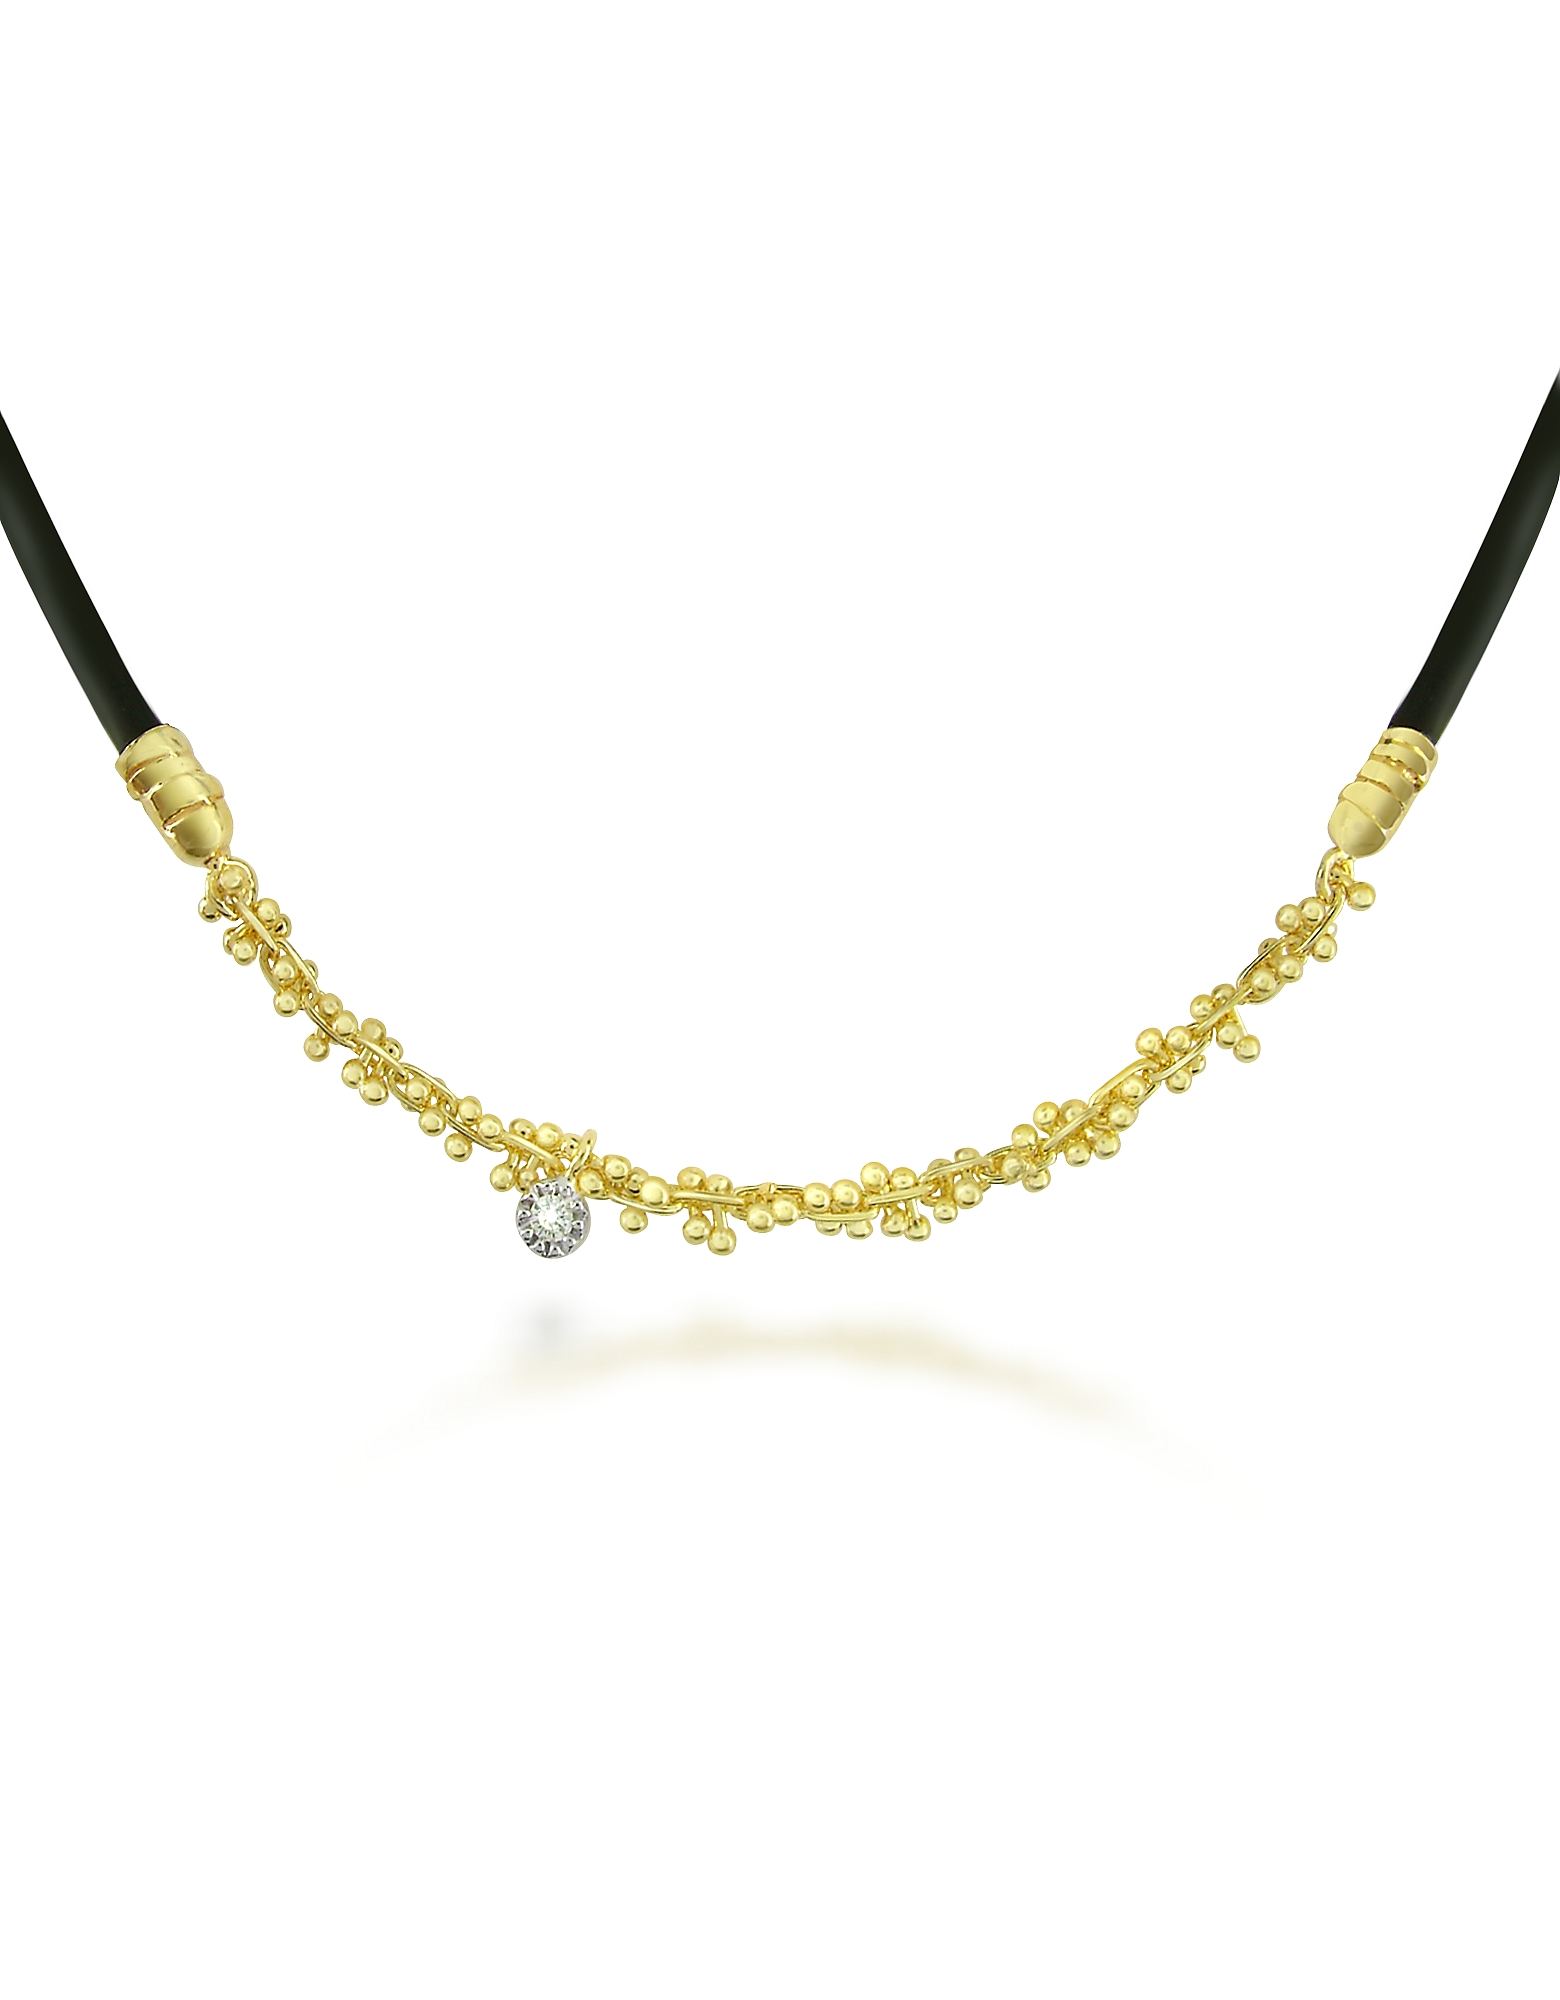 Orlando Orlandini Necklaces, Flirt - Diamond 18K Yellow Gold and Rubber Necklace